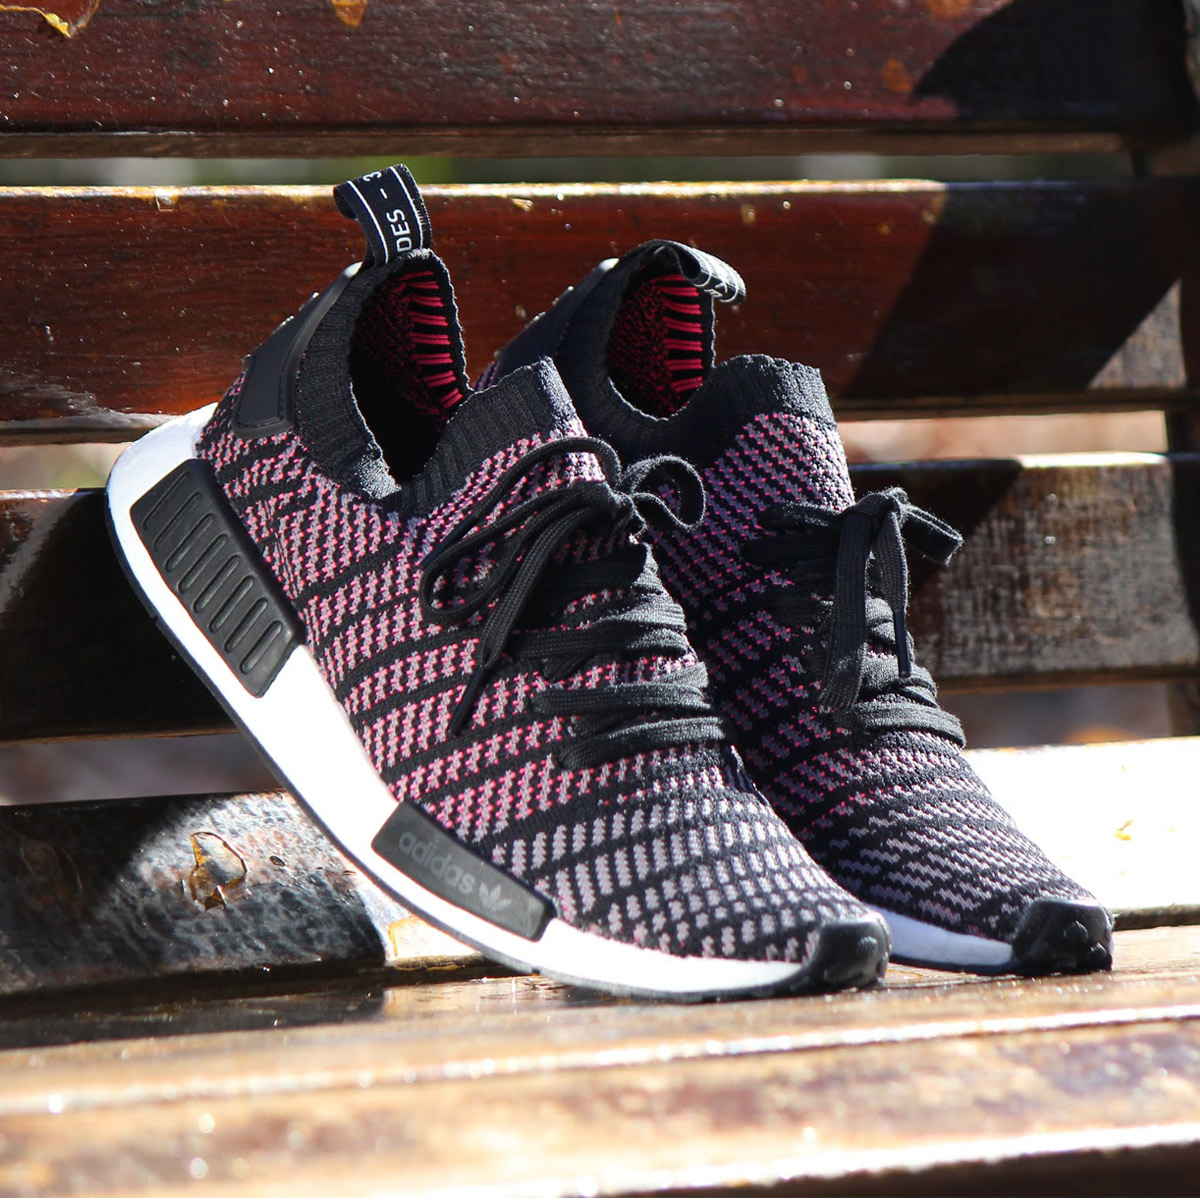 bf1482f48386 adidas Originals NMD R1 STLT PK (Adidas originals N M D R1 STLT PK) Core  Black Grey Four Solar Pink 18SP-S